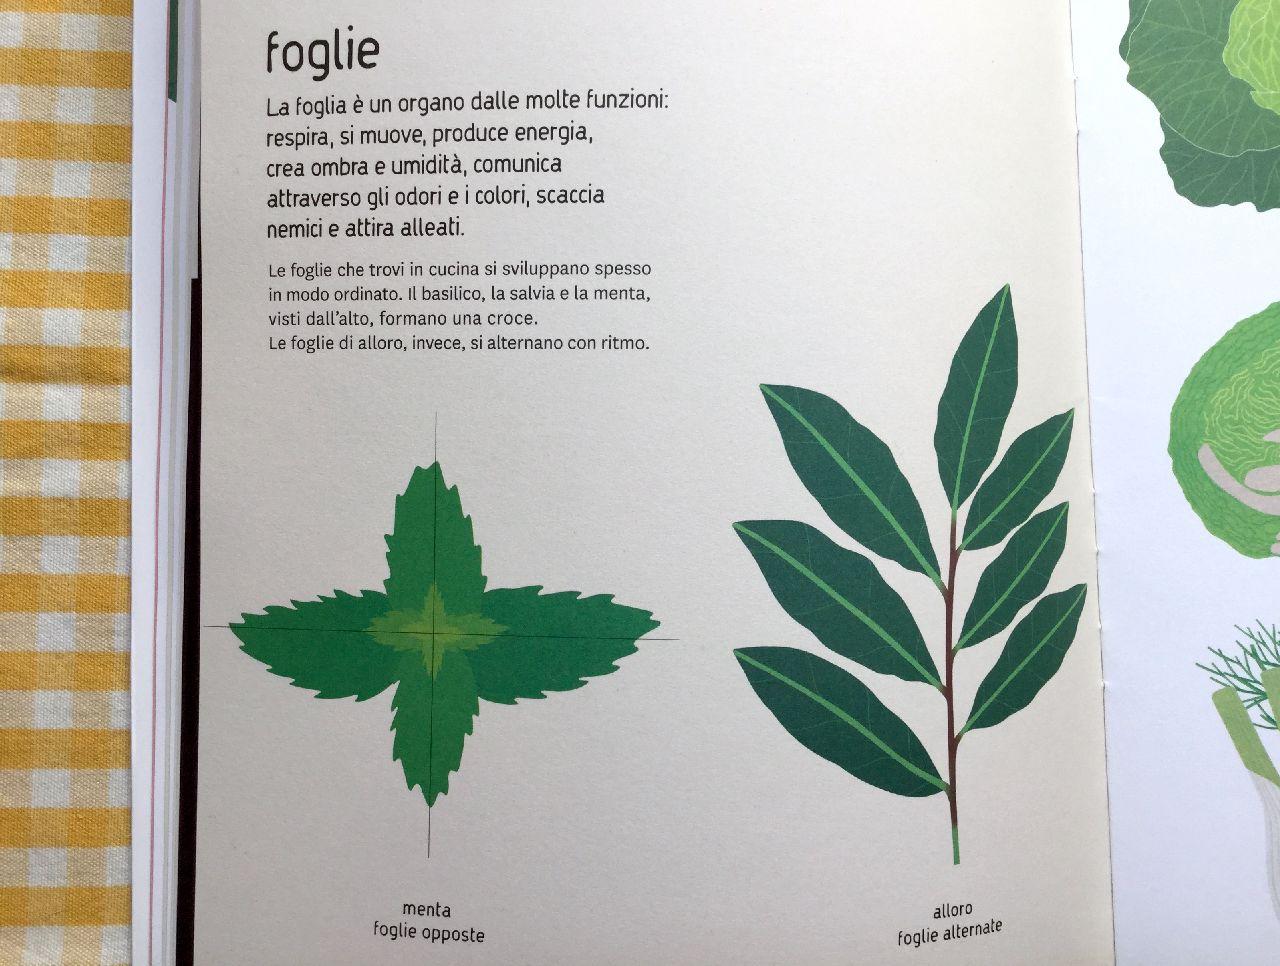 Federica Buglioni - Anna Resmini, Naturalisti in cucina, Topipittori